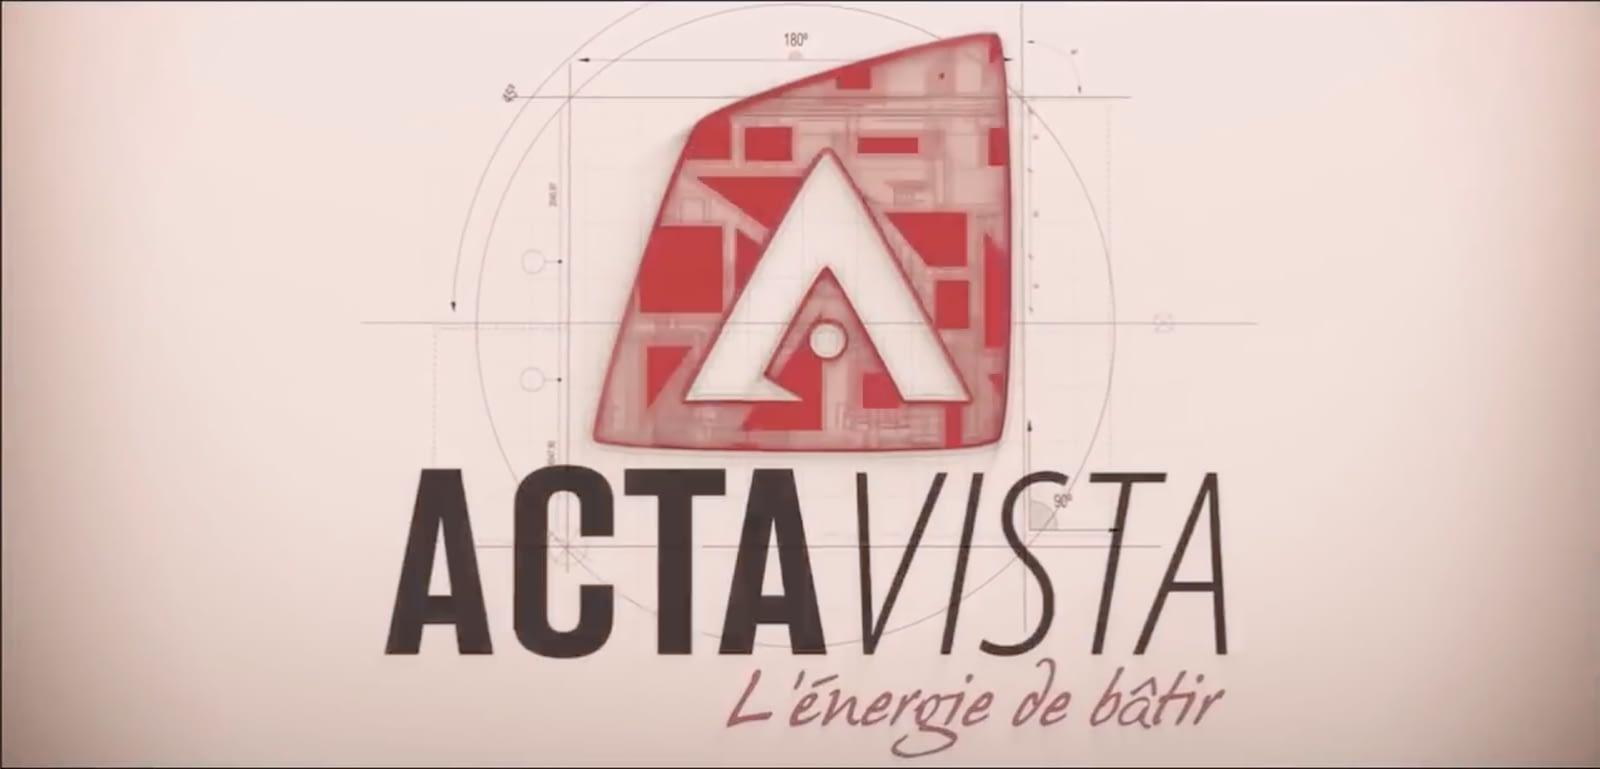 Vignette vidéo Acta Vista